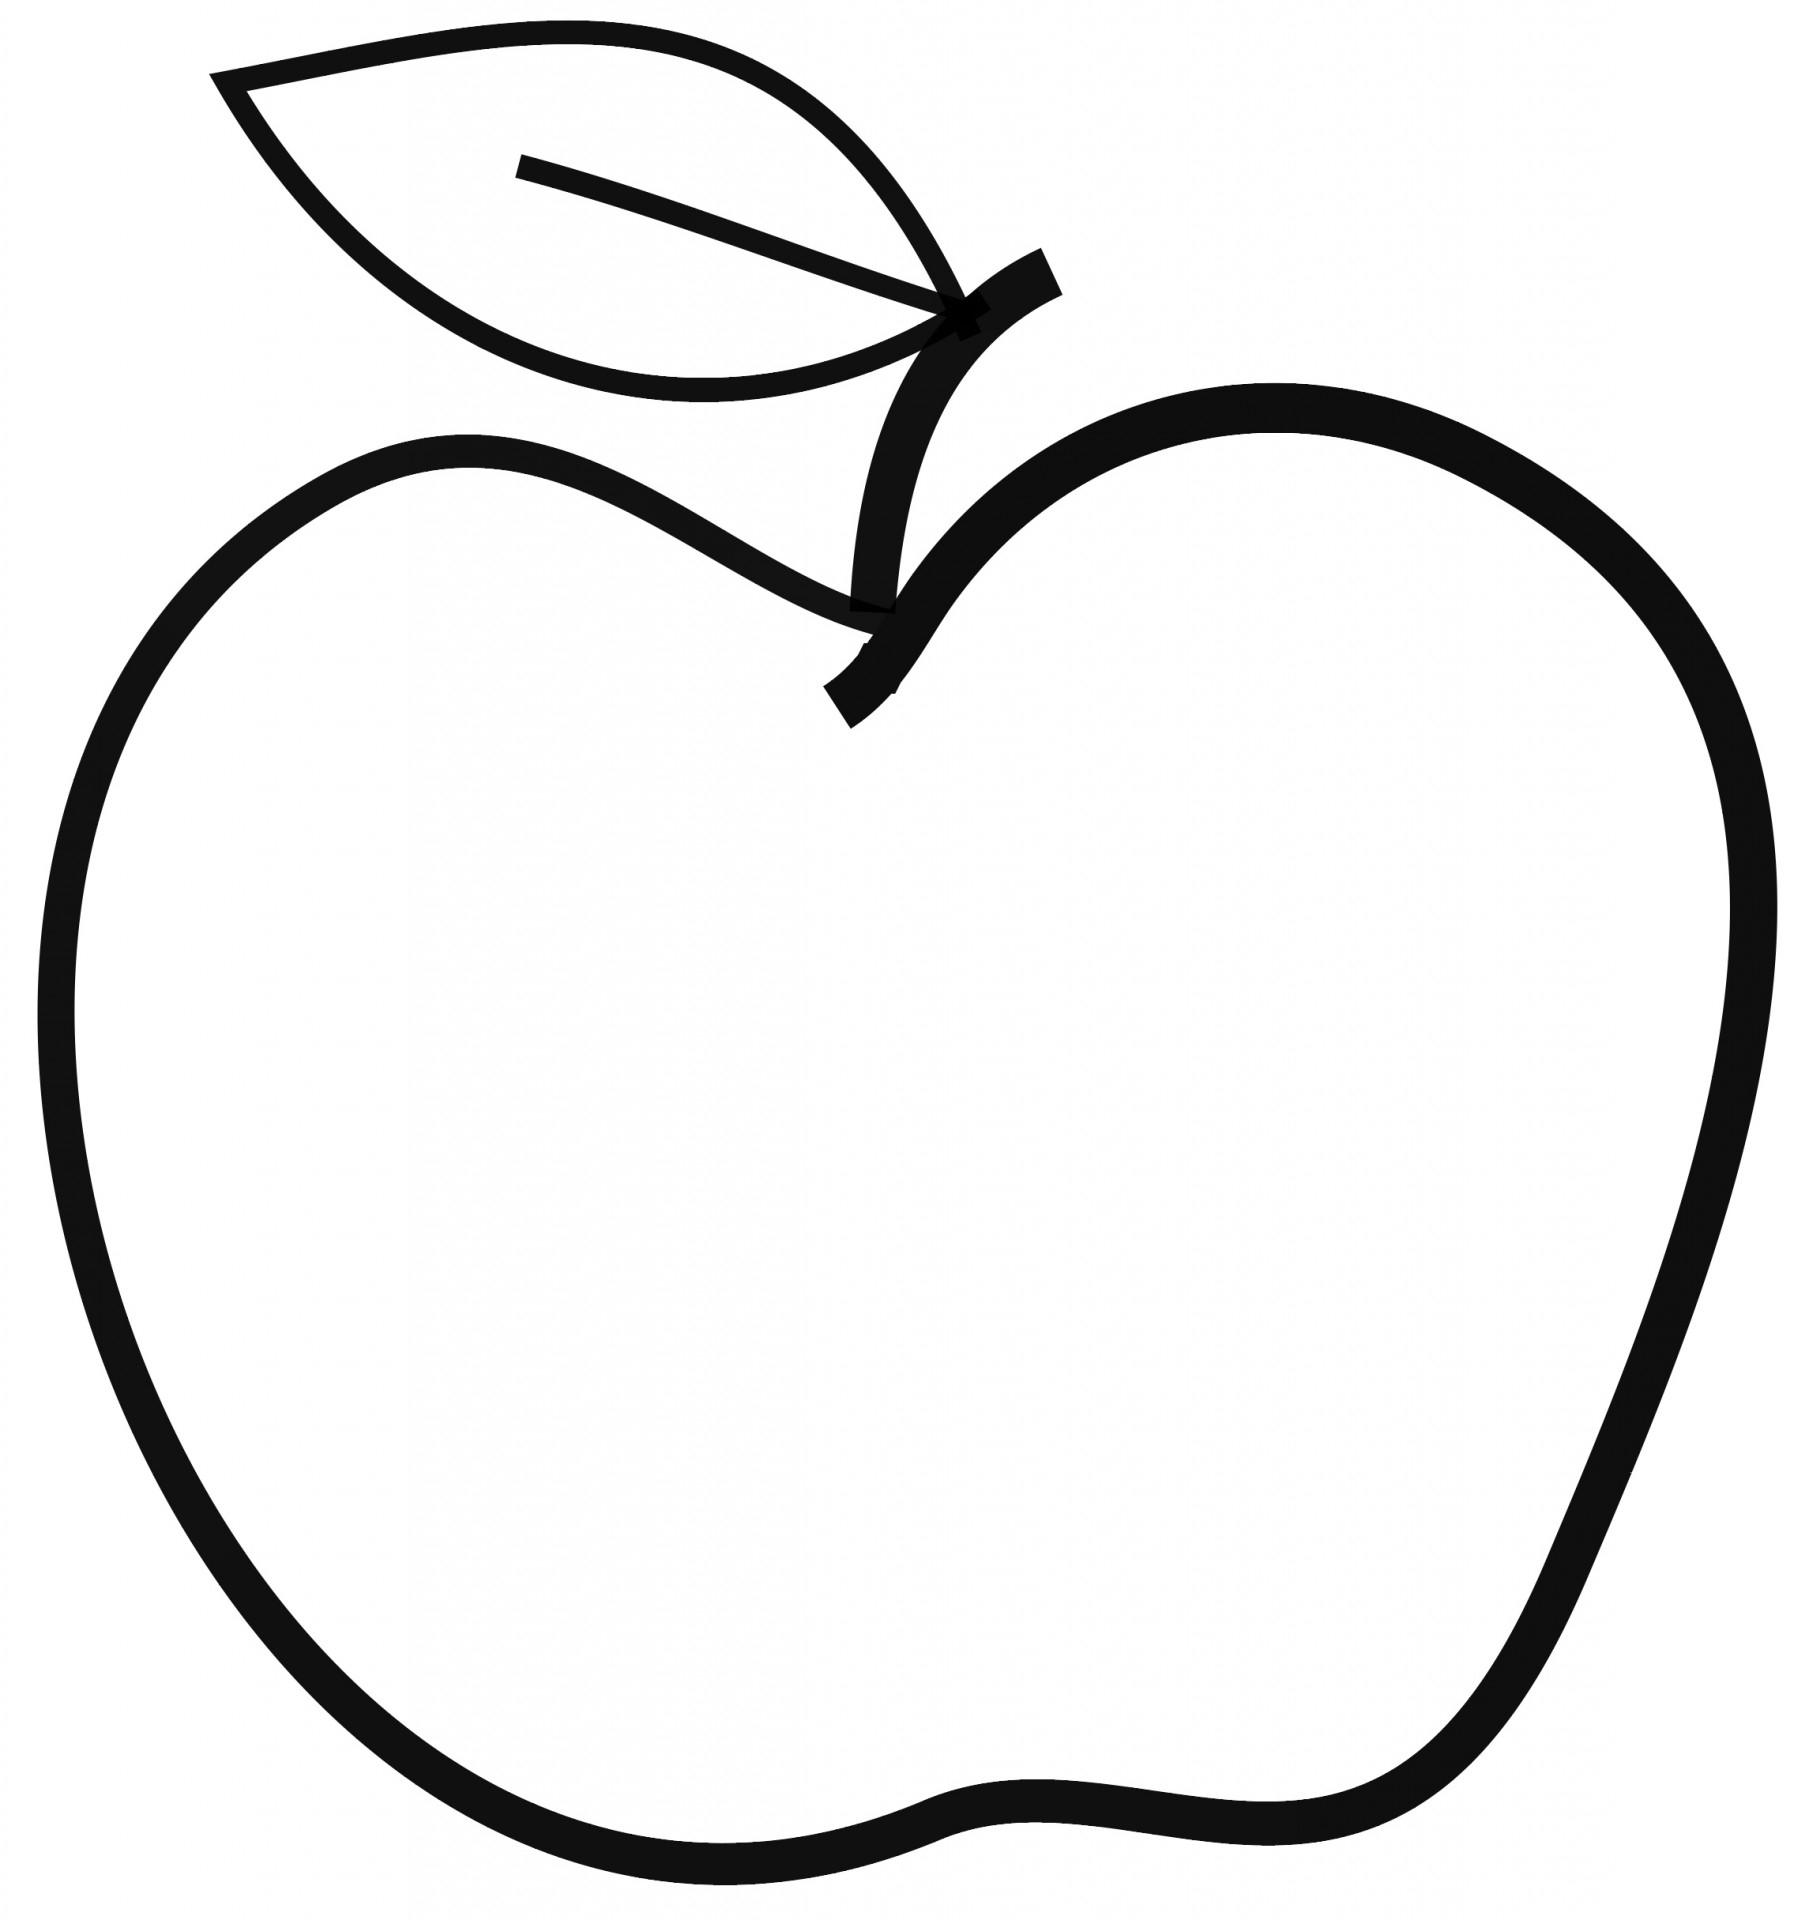 Apple clipart black and white Lovely Apple clip art free.